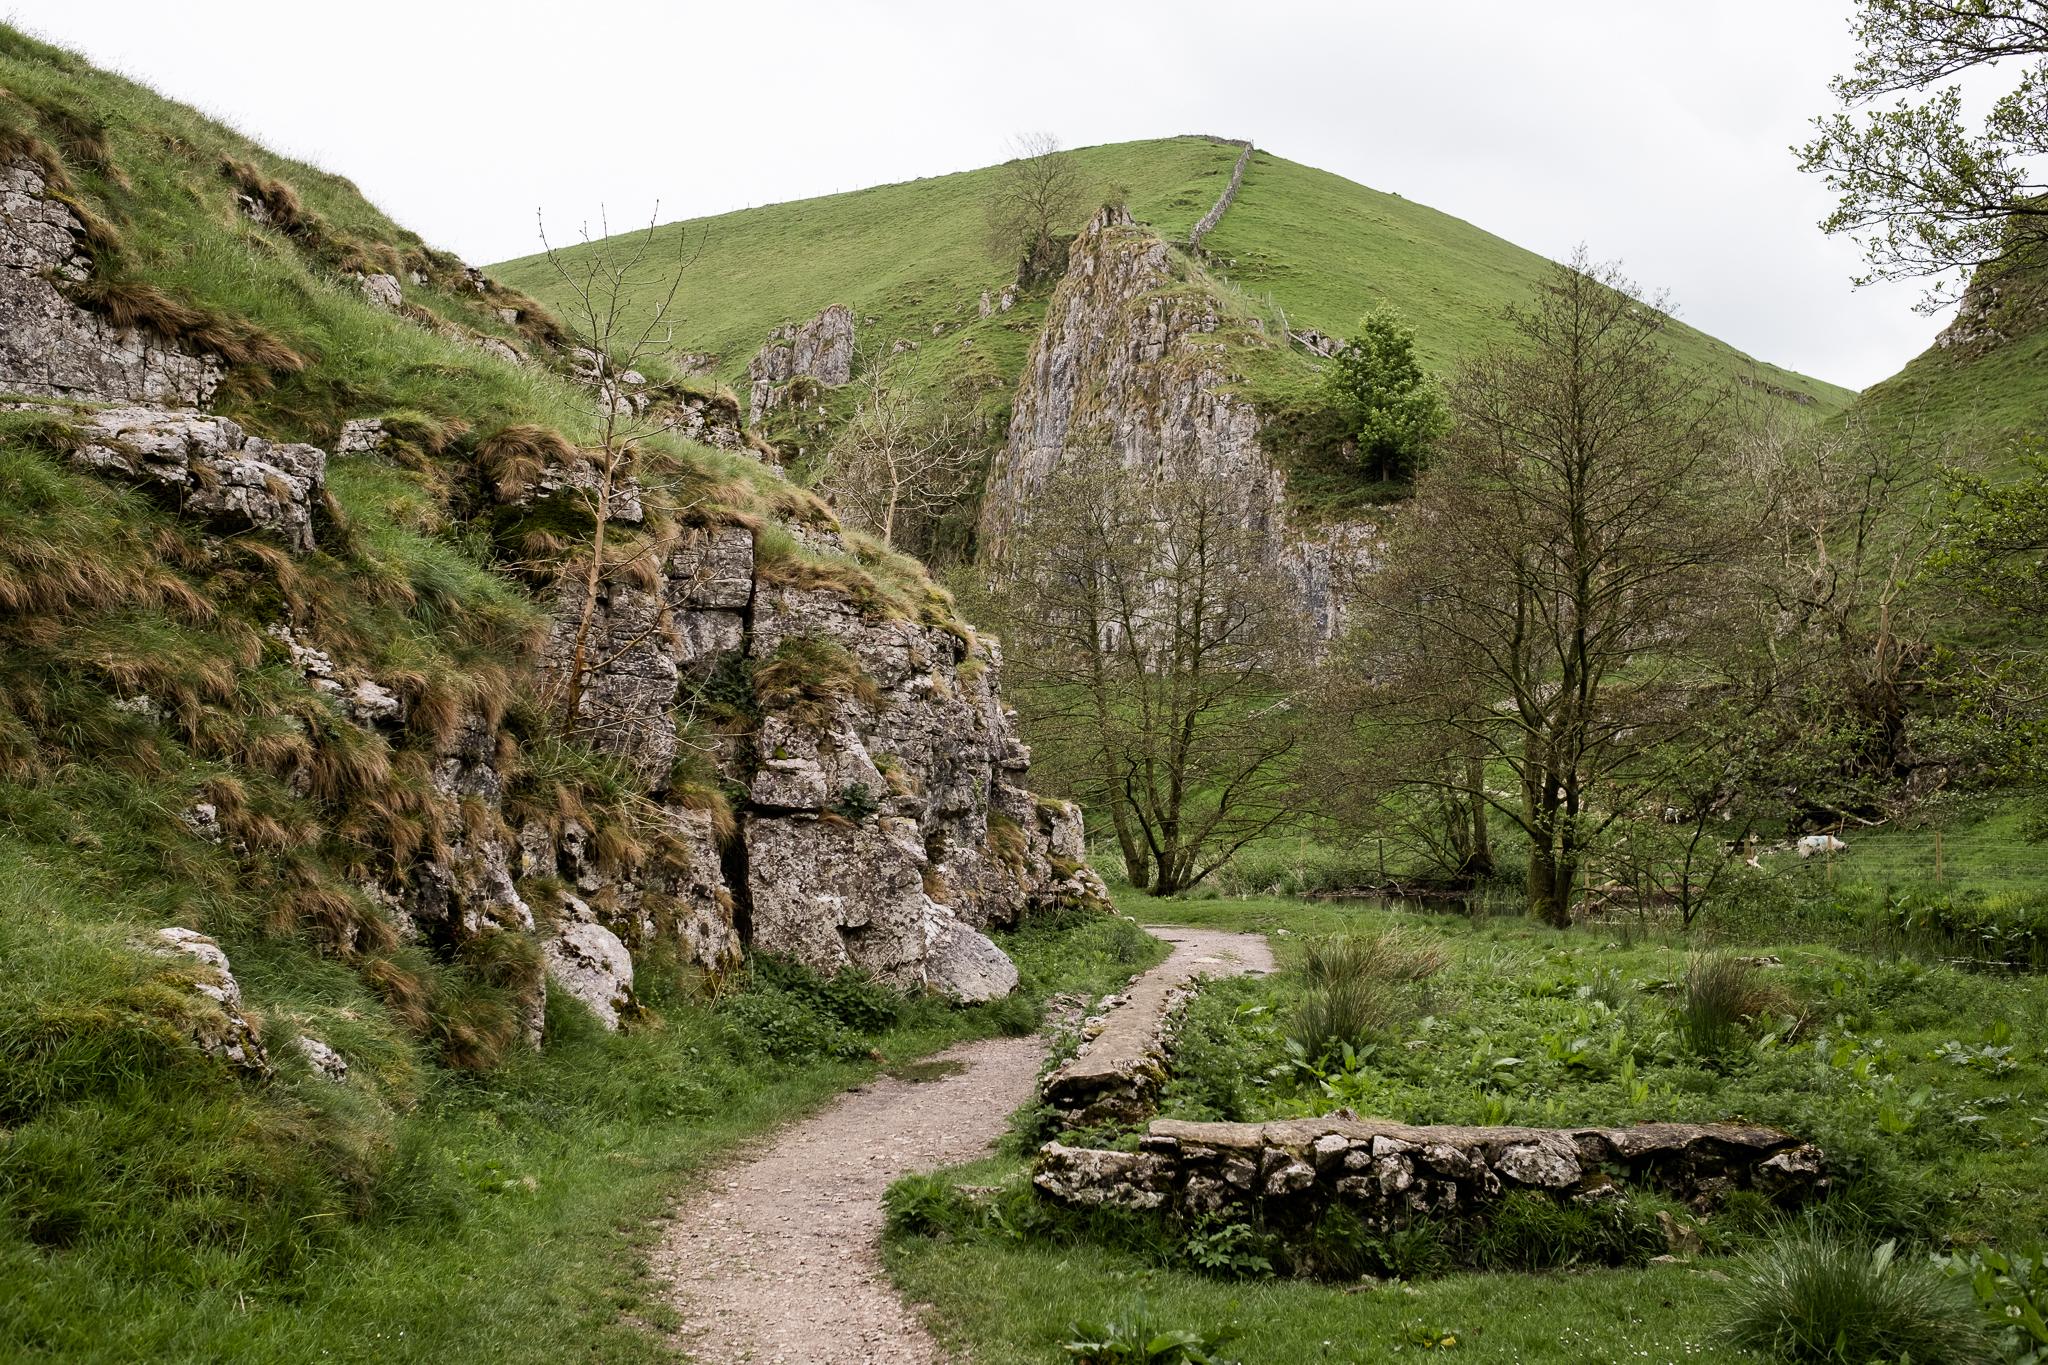 05.19.2017 The Photowalk Network Get Some Fresh Air Photowalk at Hartington and Biggin, Staffordshire Peak District National Trust-16.jpg